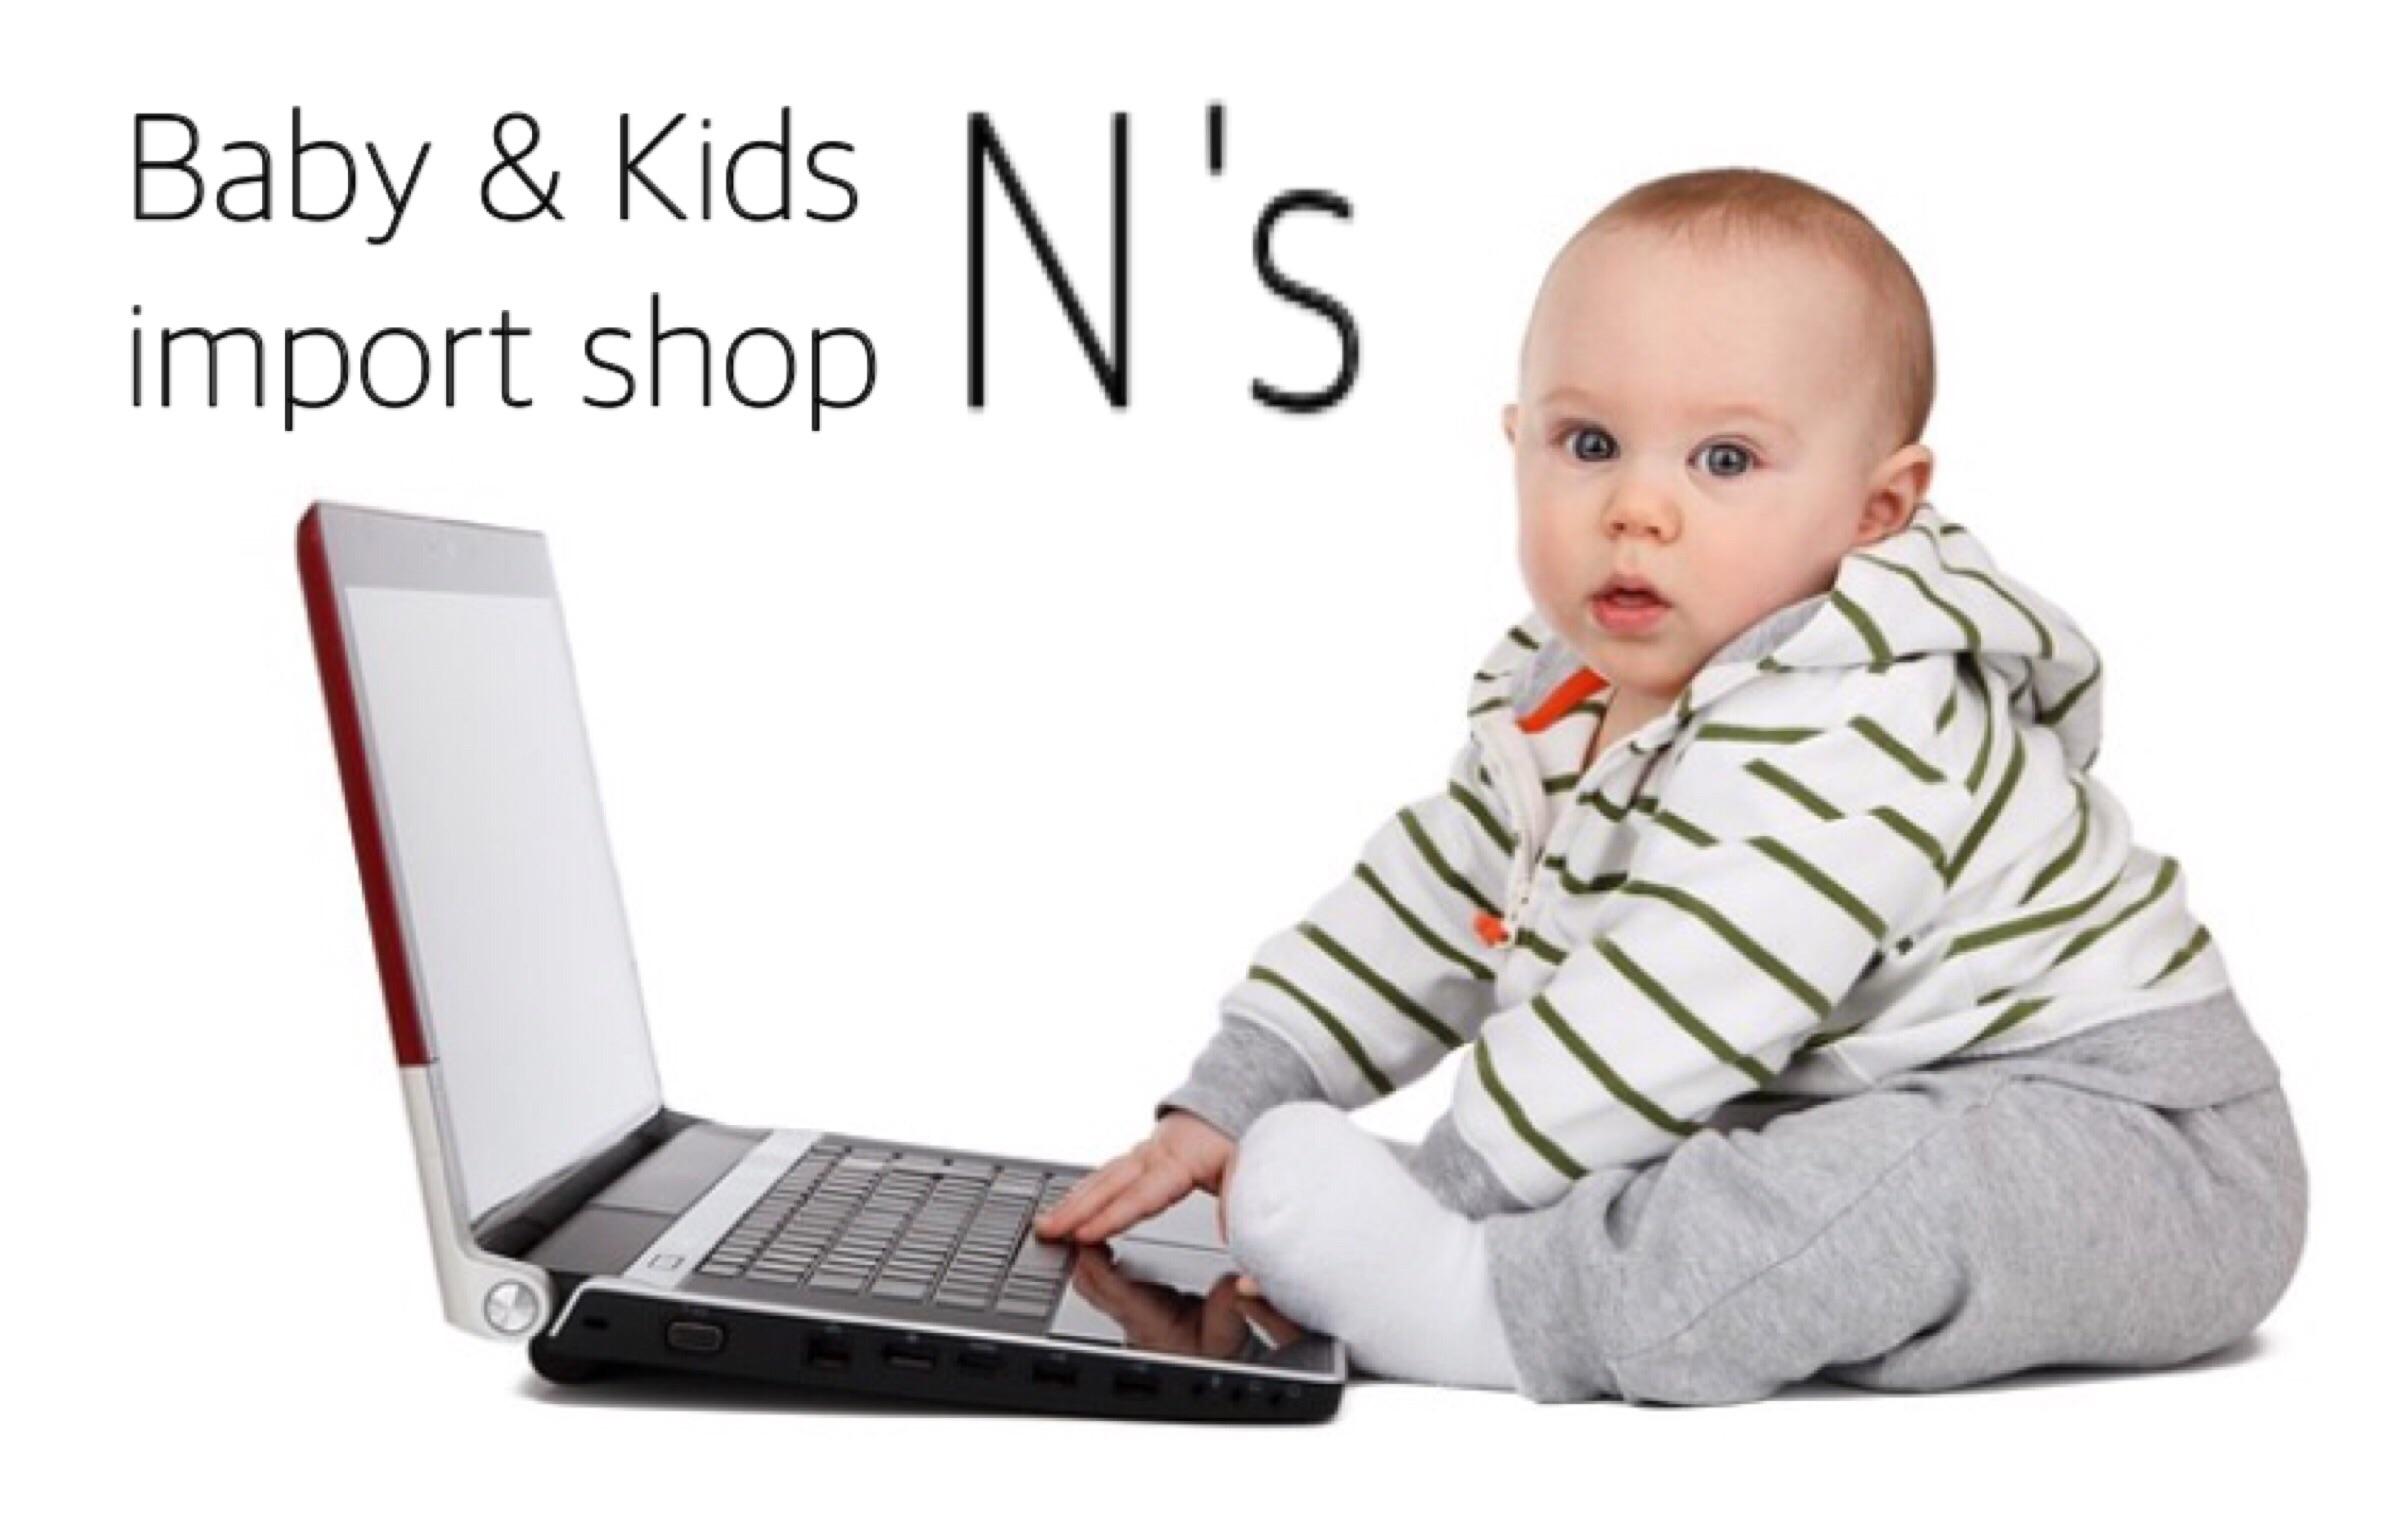 Baby&Kids import shop N's